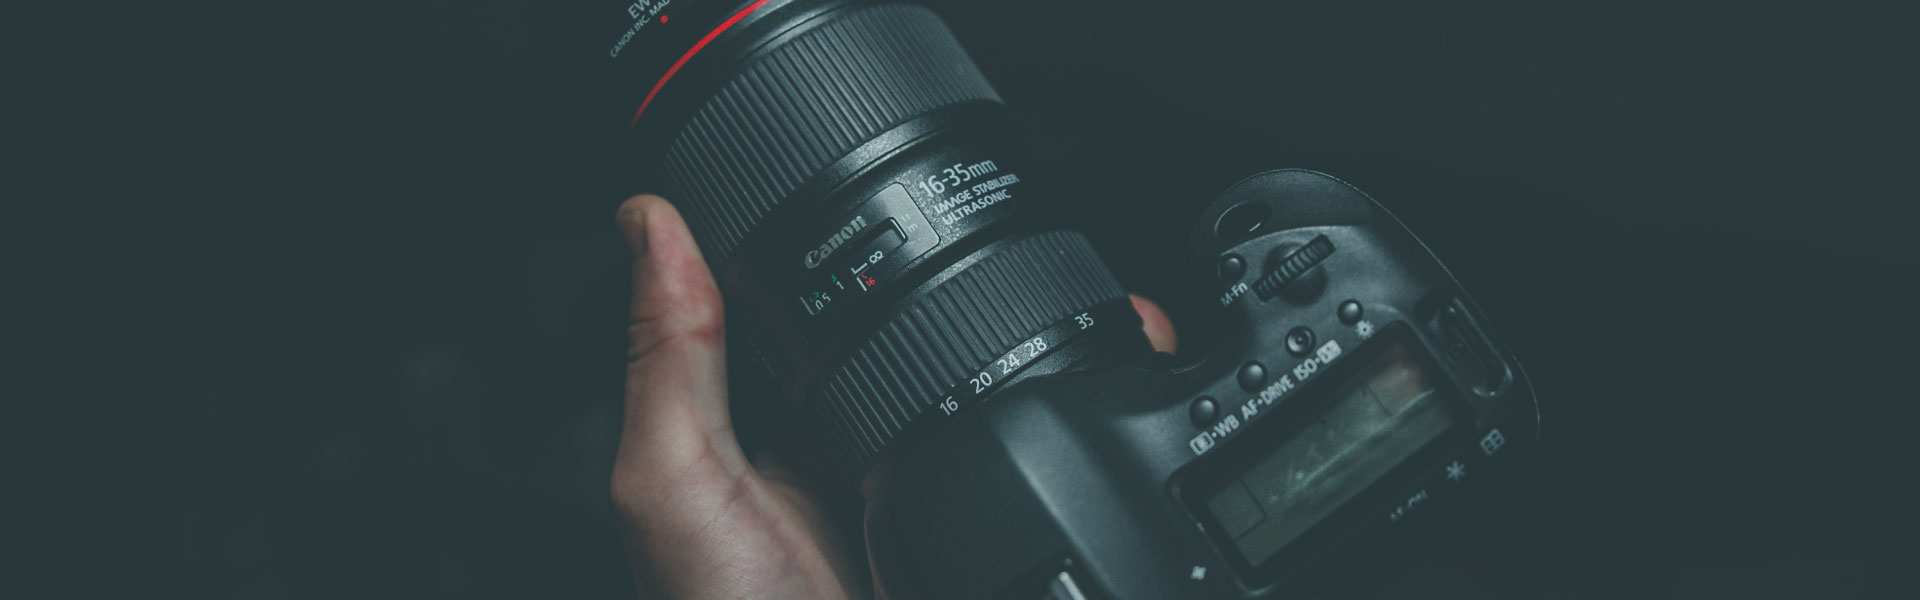 macchina-fotografica-per-ecommerce